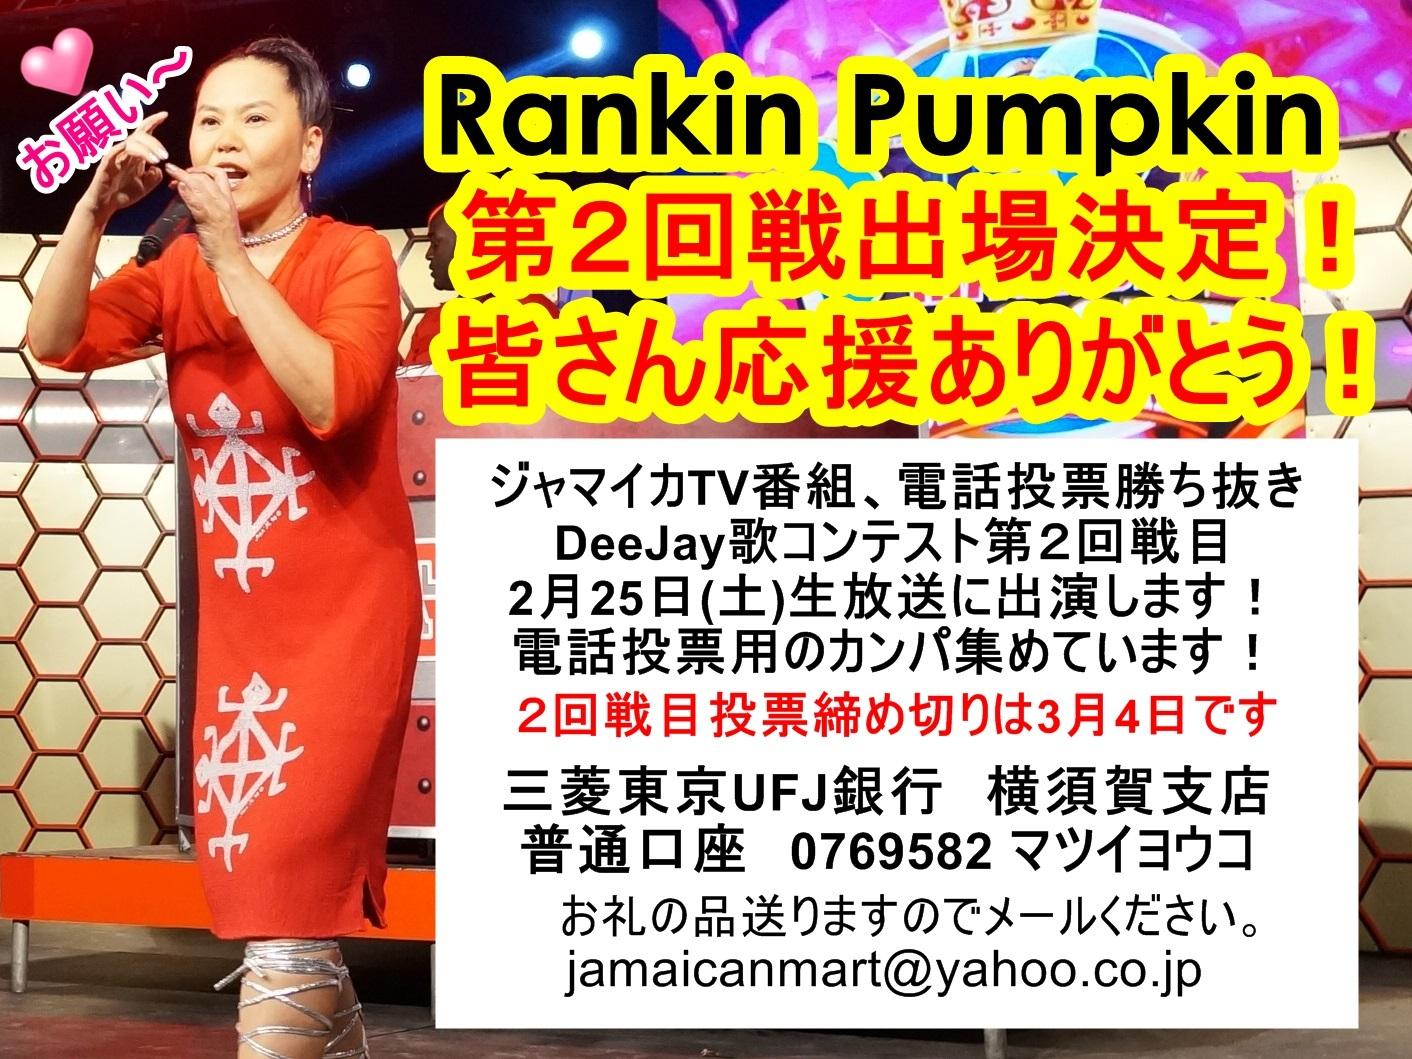 Rankin Pumpkin ジャマイカ テレビ勝ち抜き歌コンテスト 電話投票資金募集